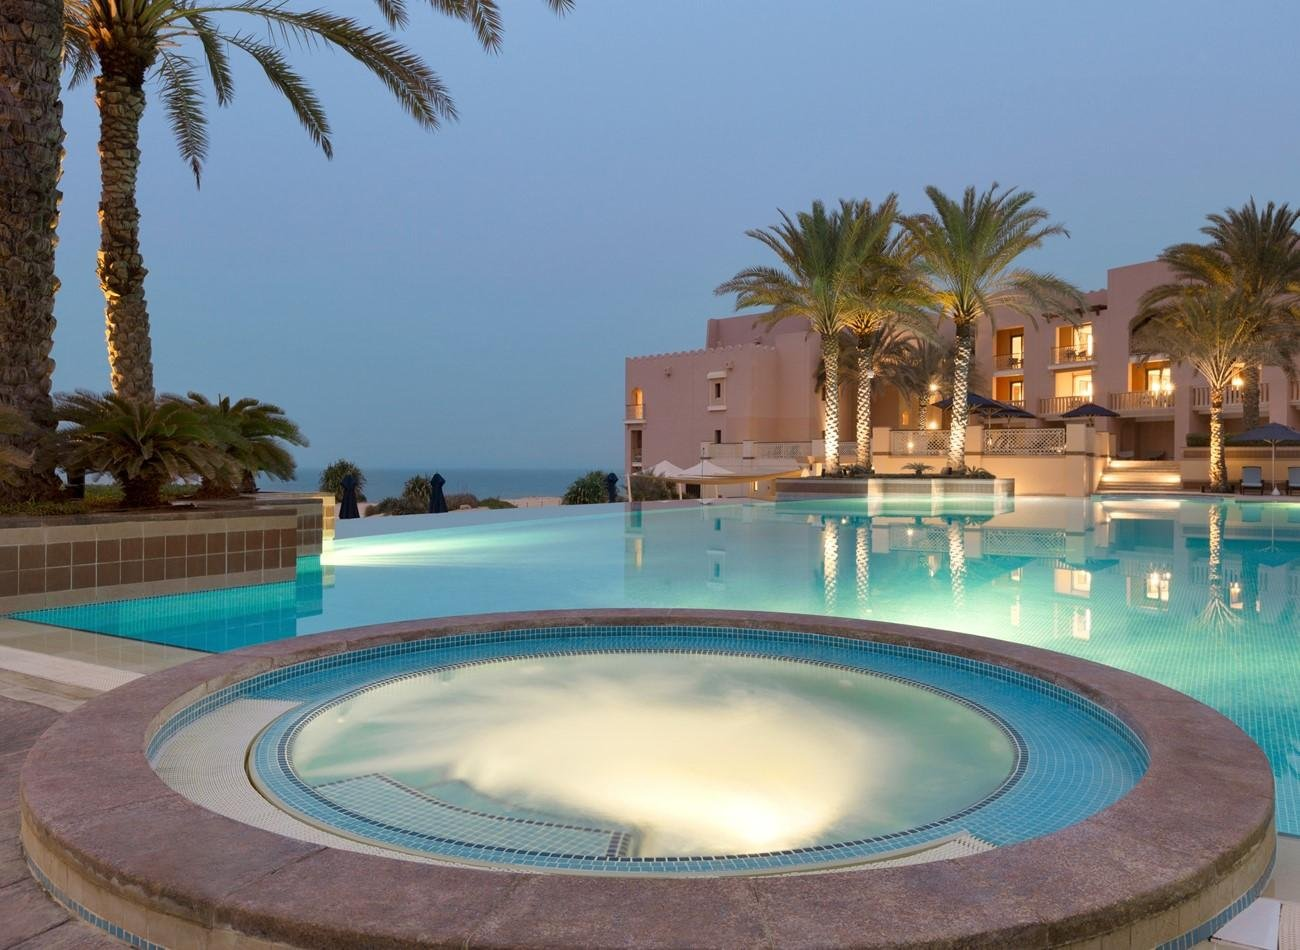 Hotel Shangri-La Al Husn zwembad en jacuzzi - Muscat